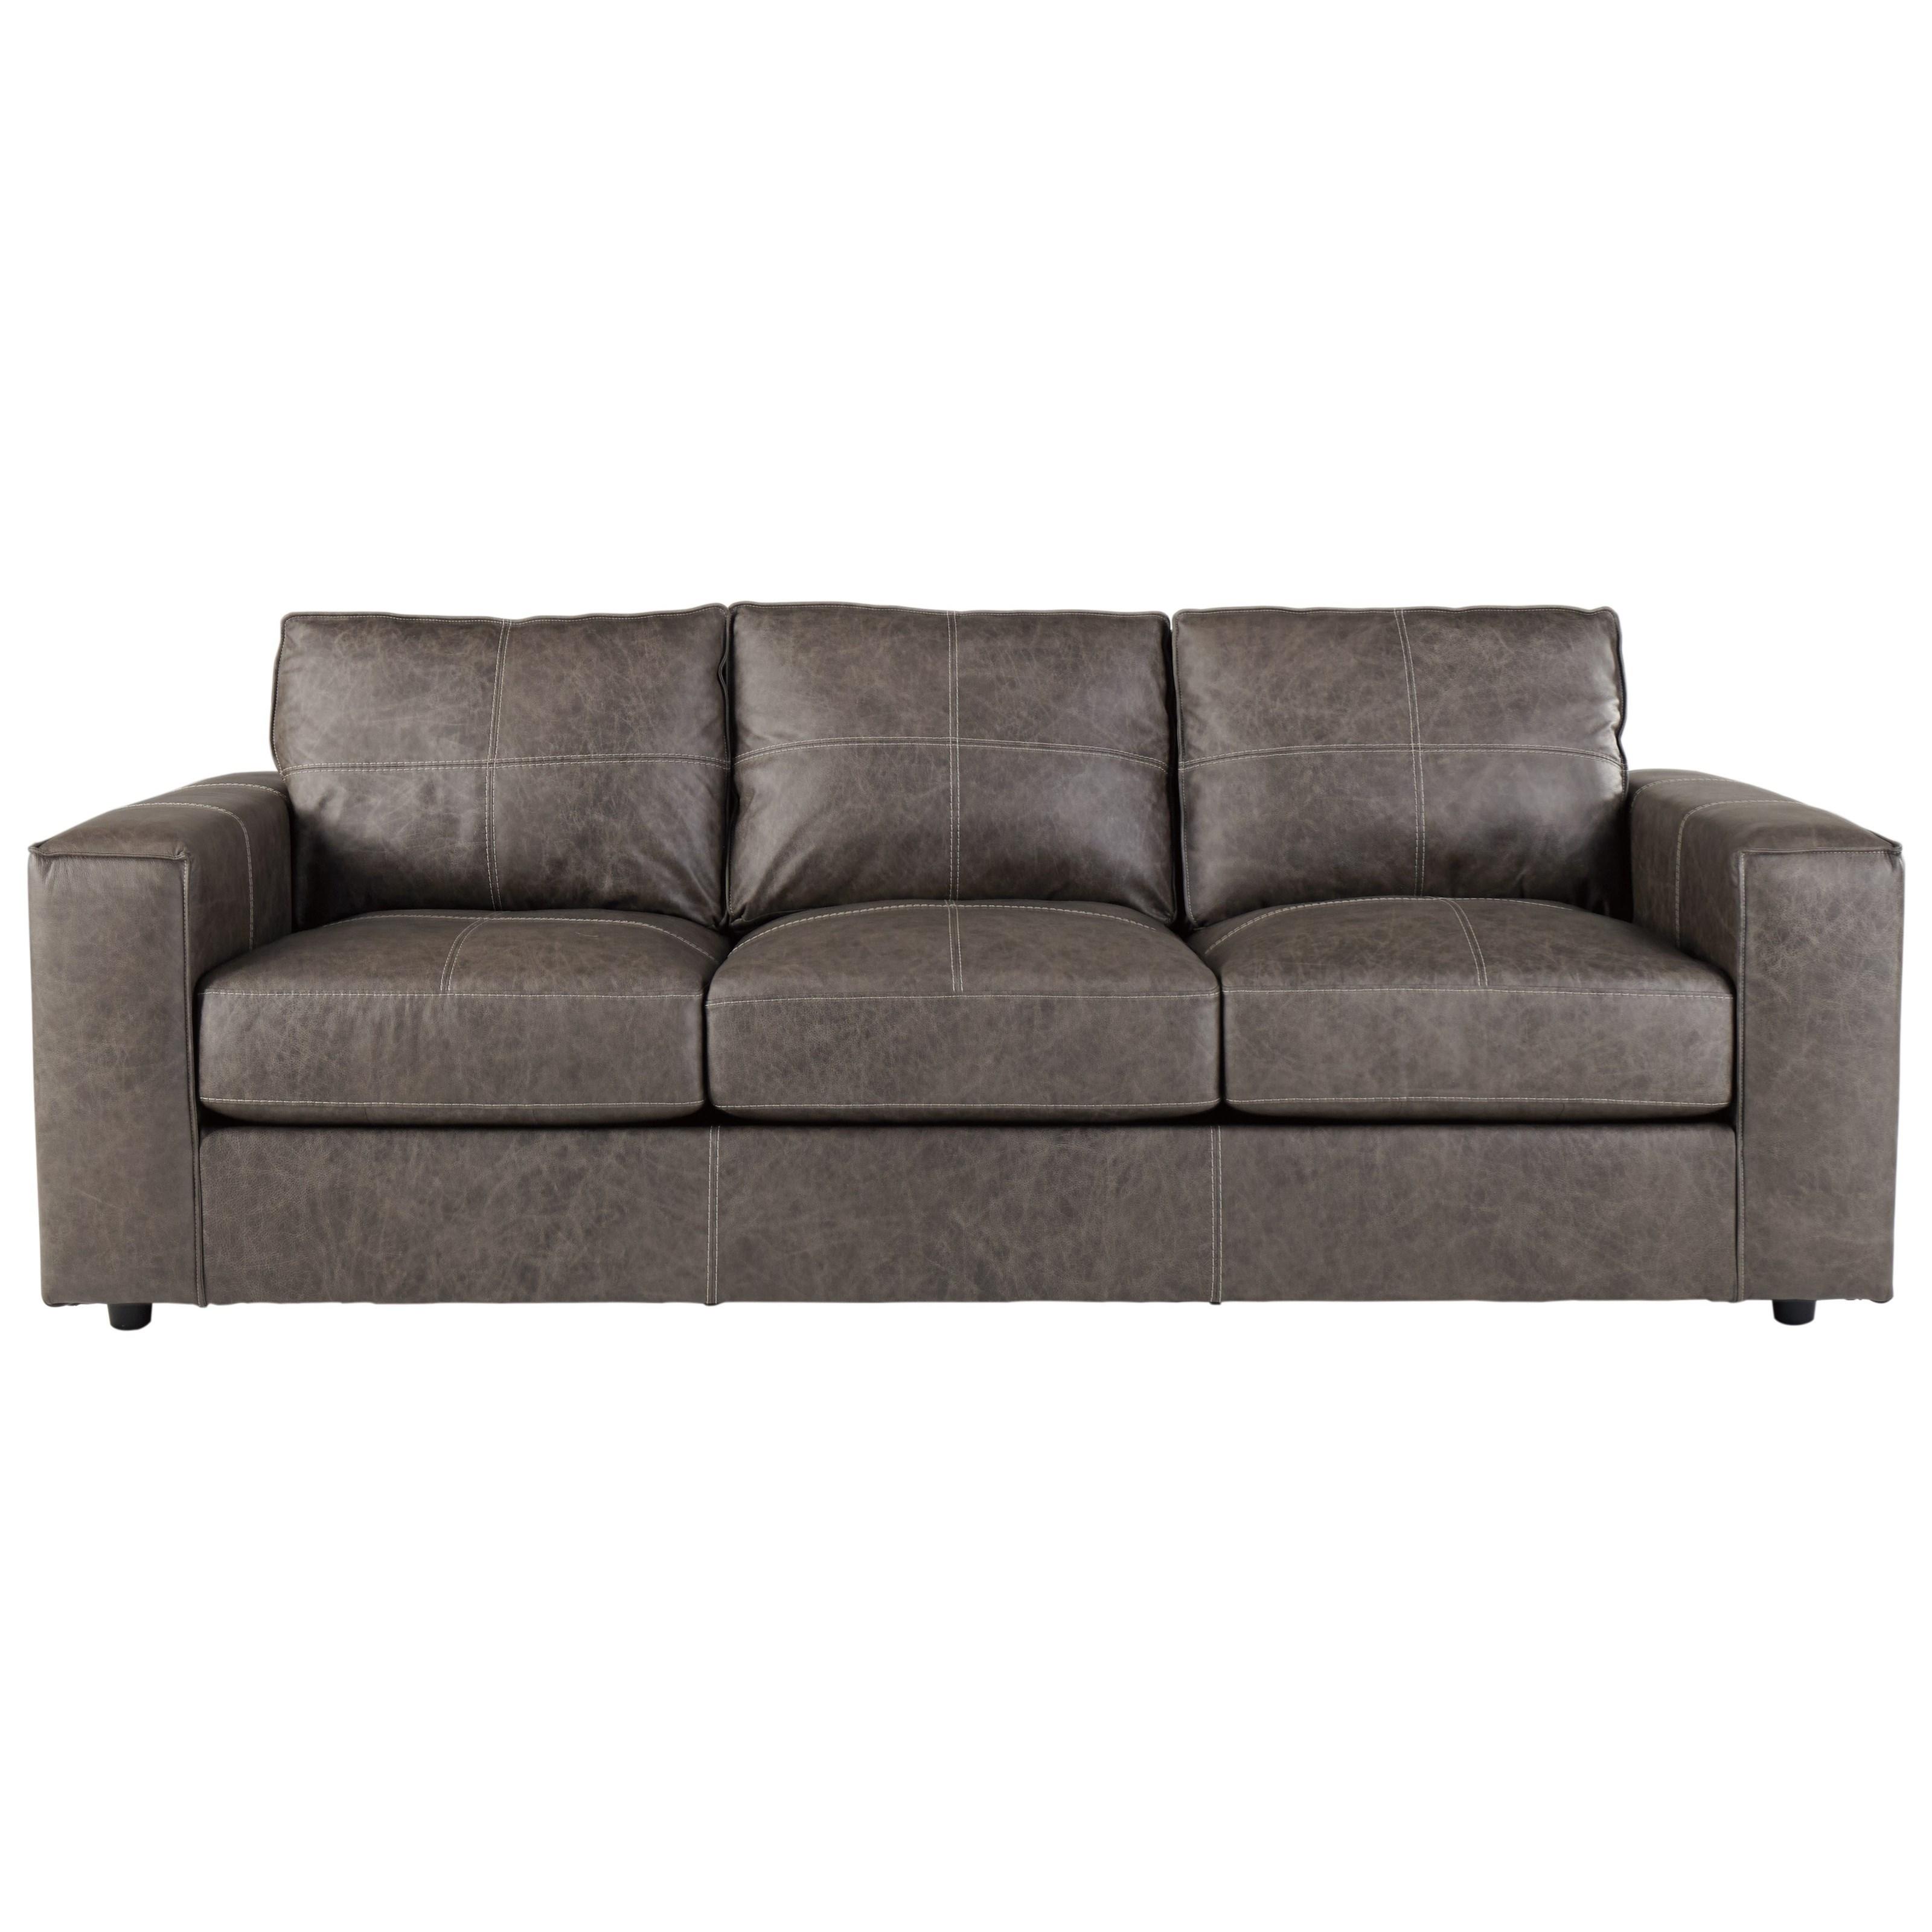 ashley furniture modern sofa pop up platform sleeper signature design by trembolt contemporary